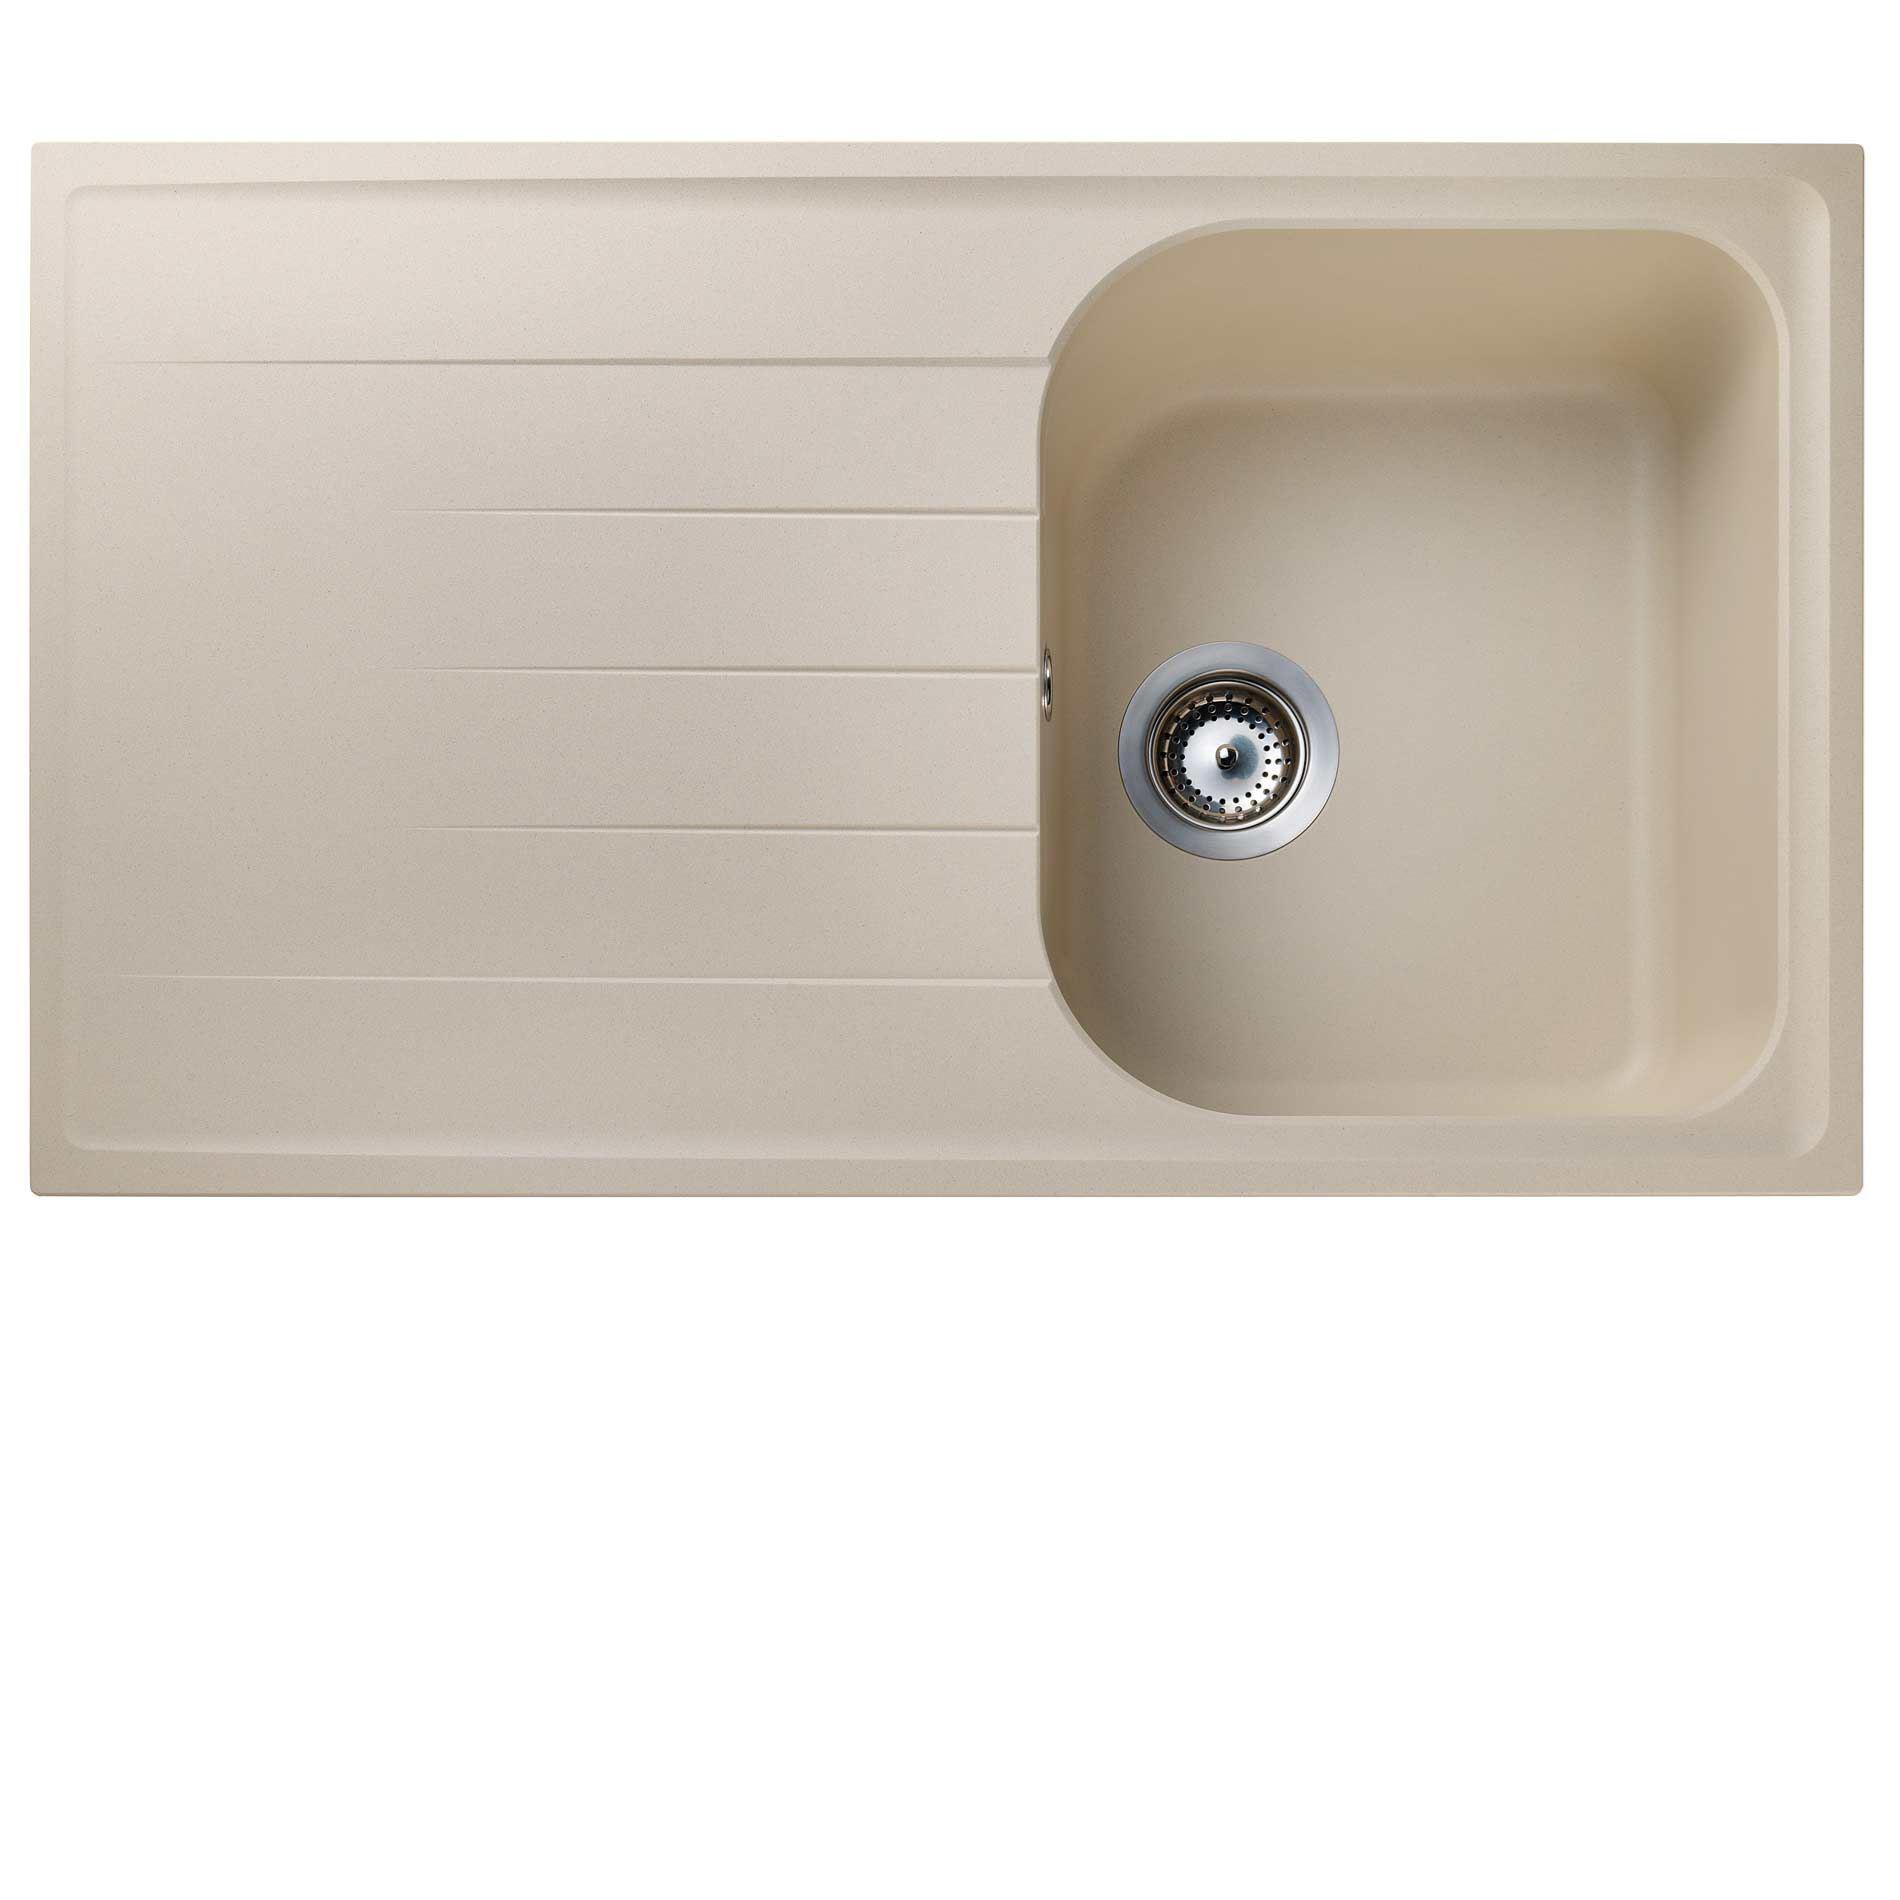 Kitchen Sinks & Taps - Rangemaster: Amethyst AME860 Stone Igneous Sink